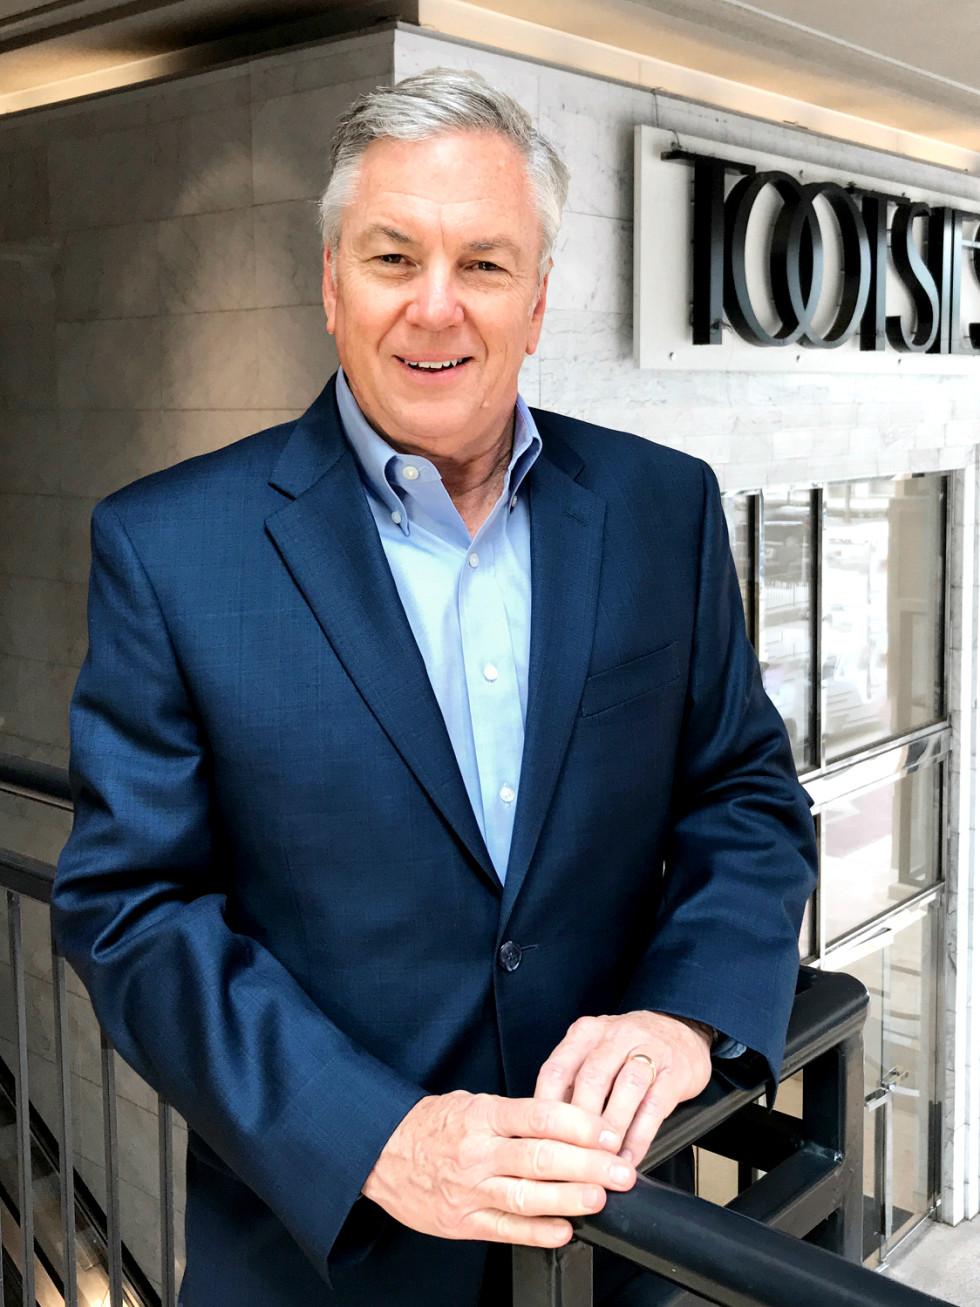 Tootsies owner Norman Lewis